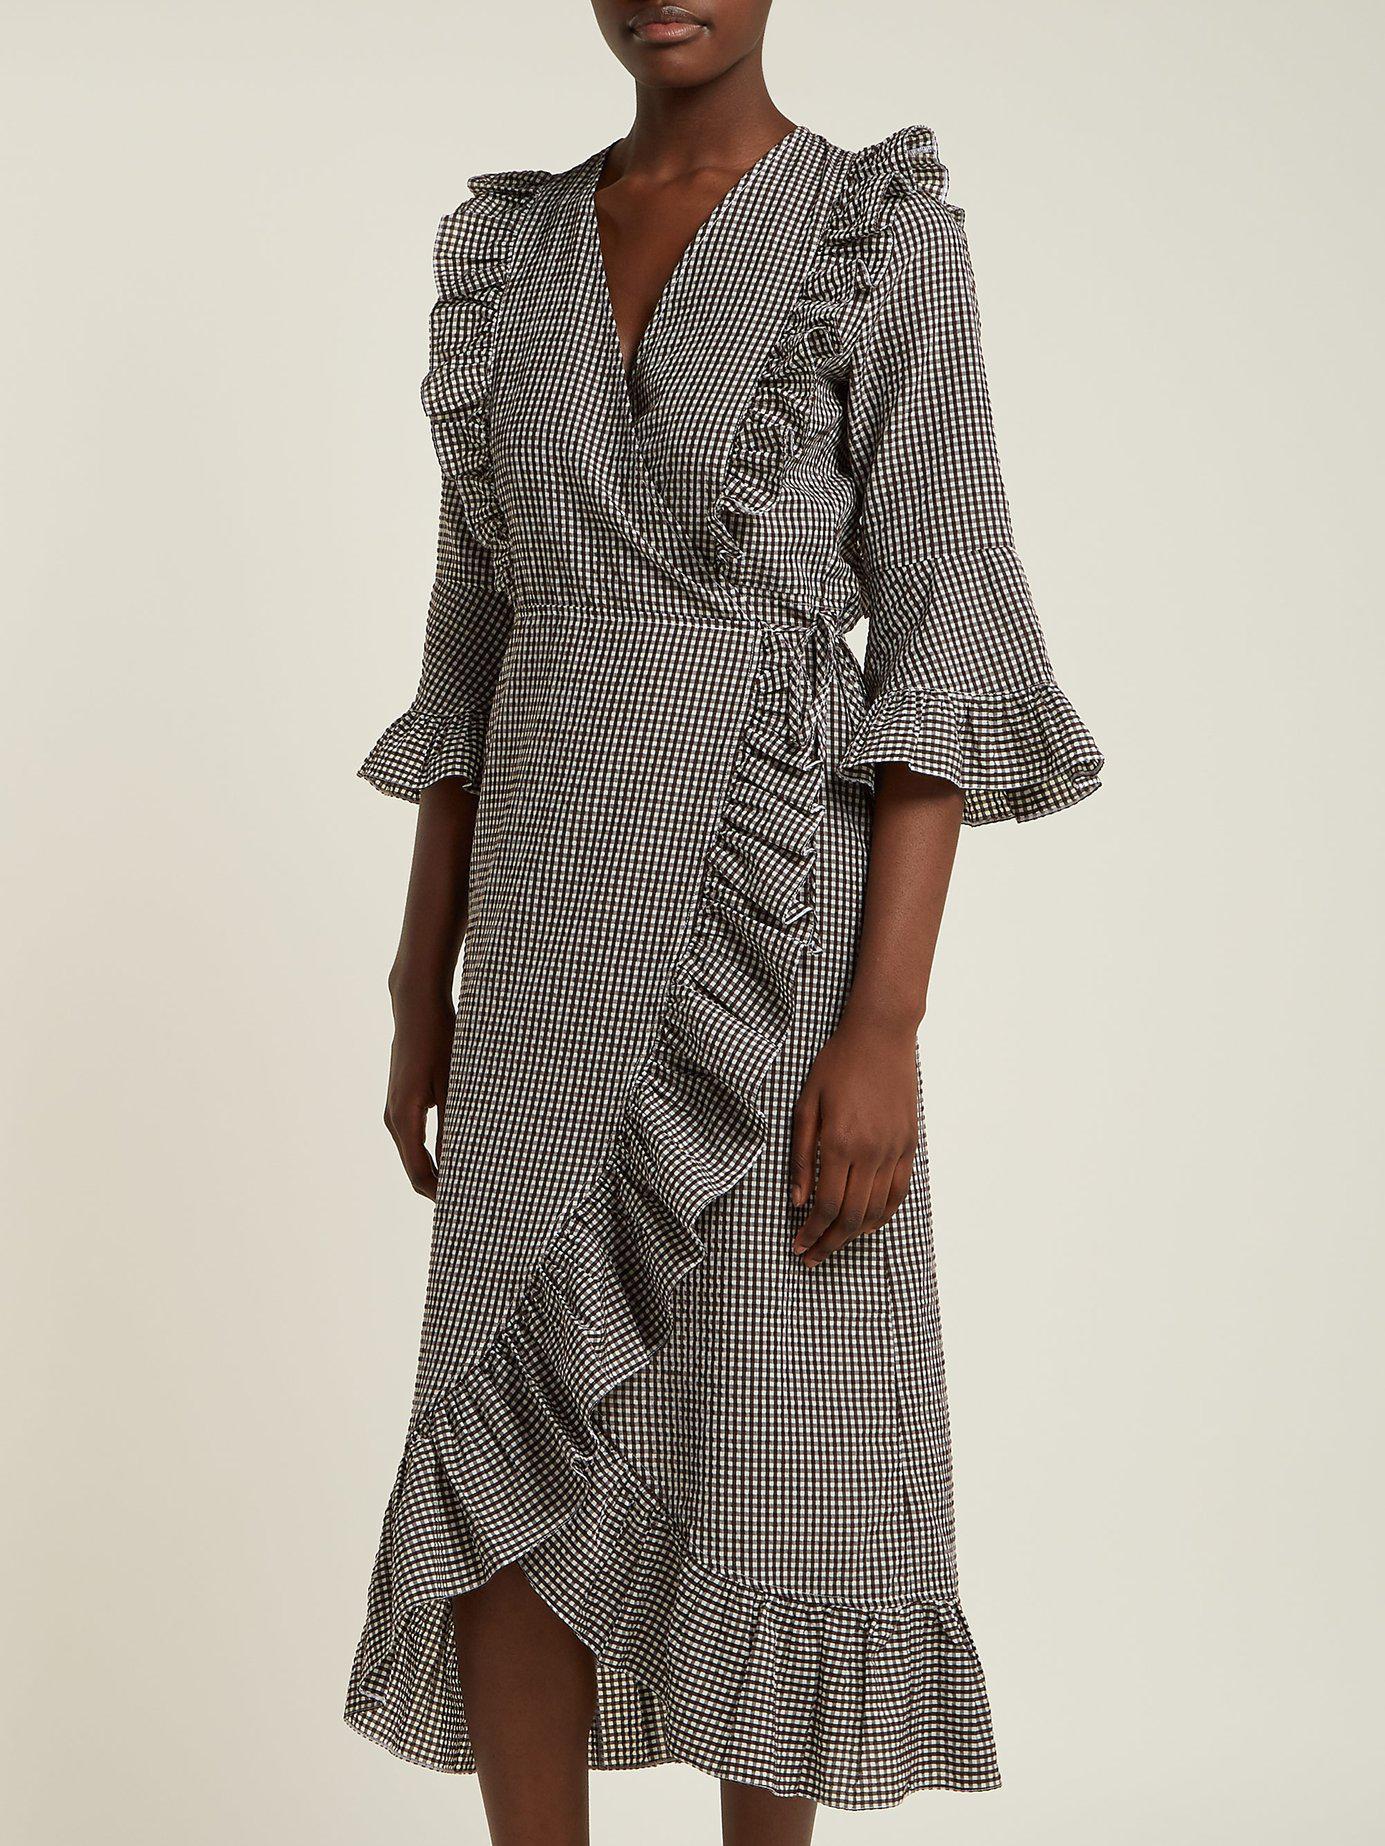 11a90683 Ganni Charron Gingham Cotton-blend Wrap Dress in Brown - Lyst